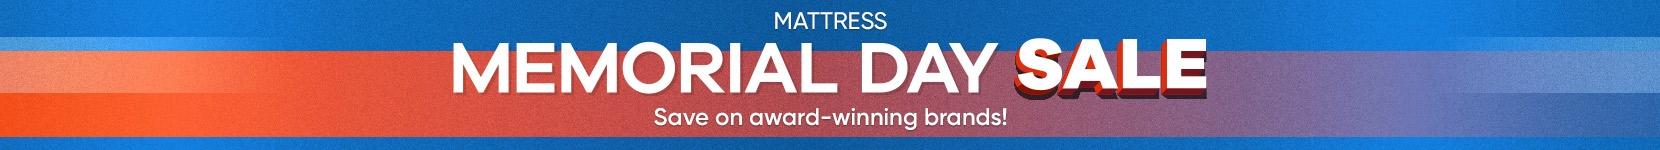 mattress. memorial say sale.save on award-winning brands!